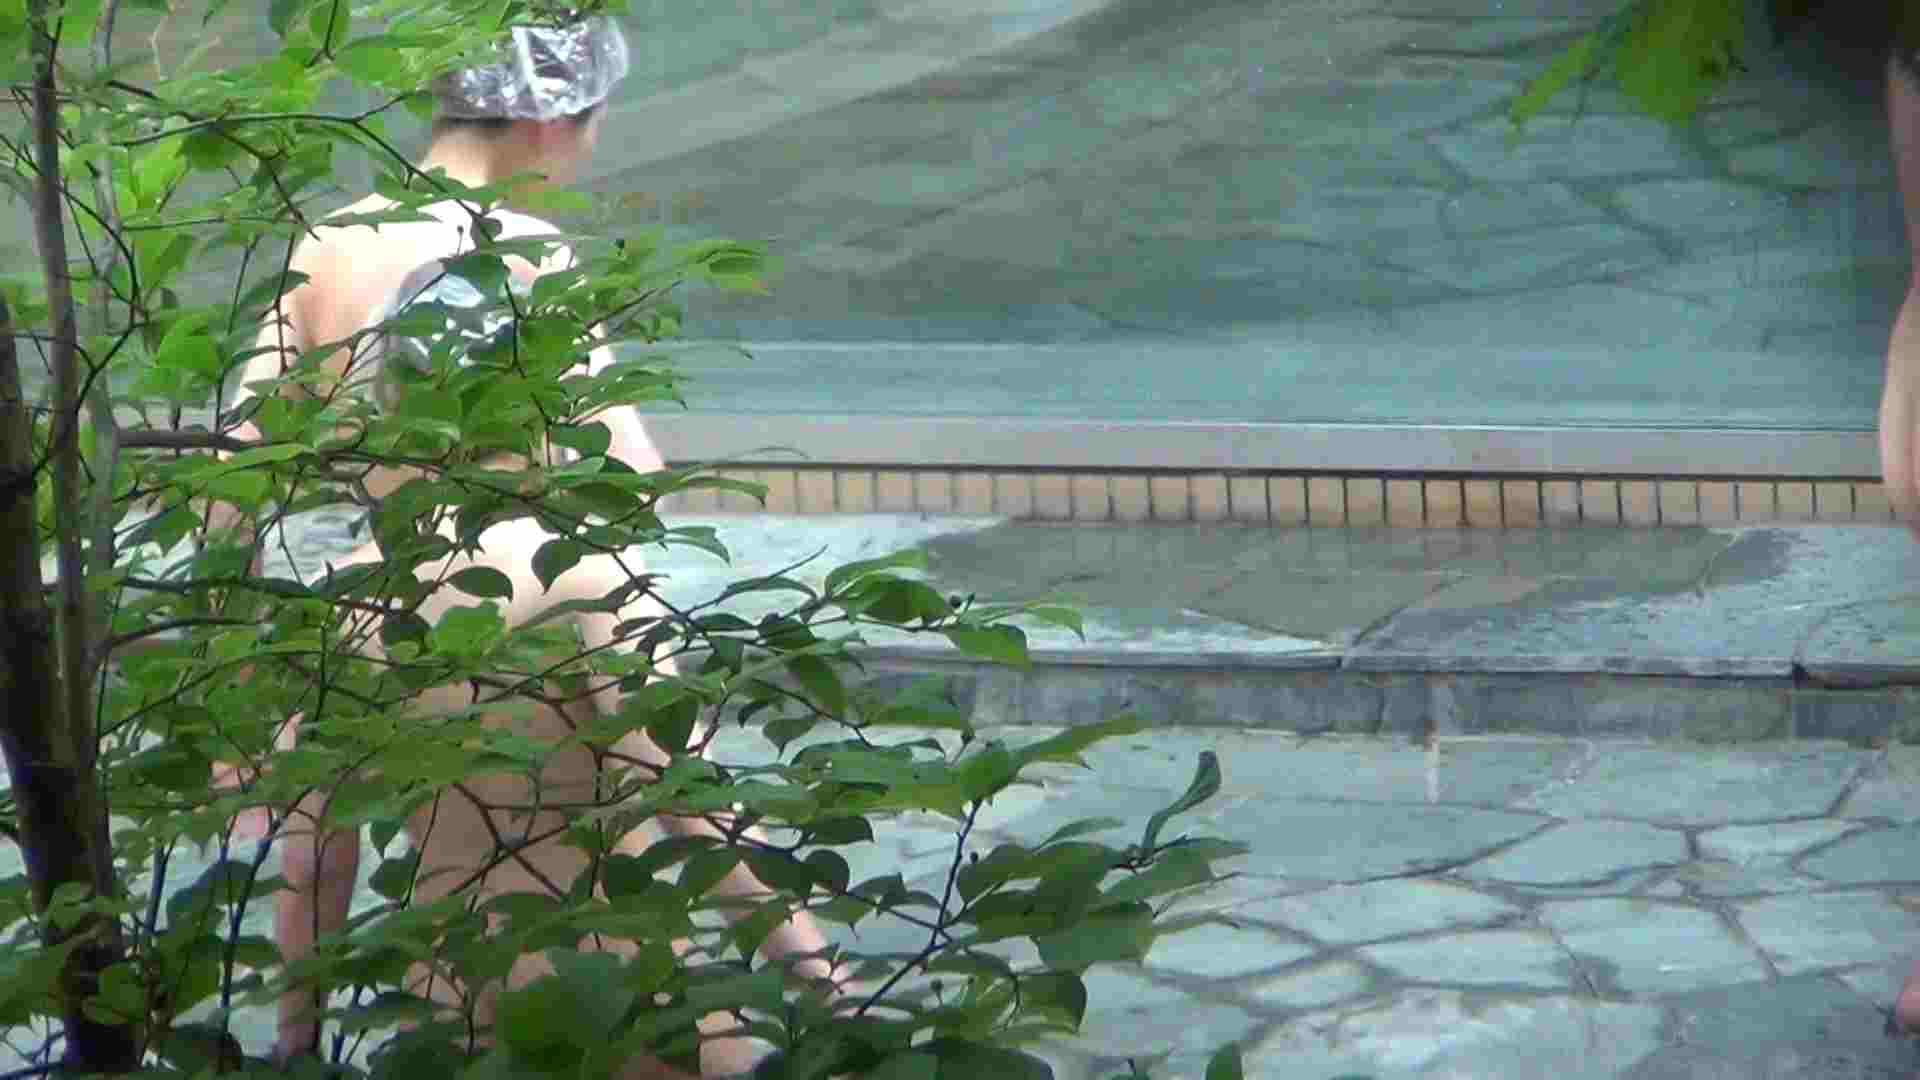 Aquaな露天風呂Vol.255 OL女体  99連発 18